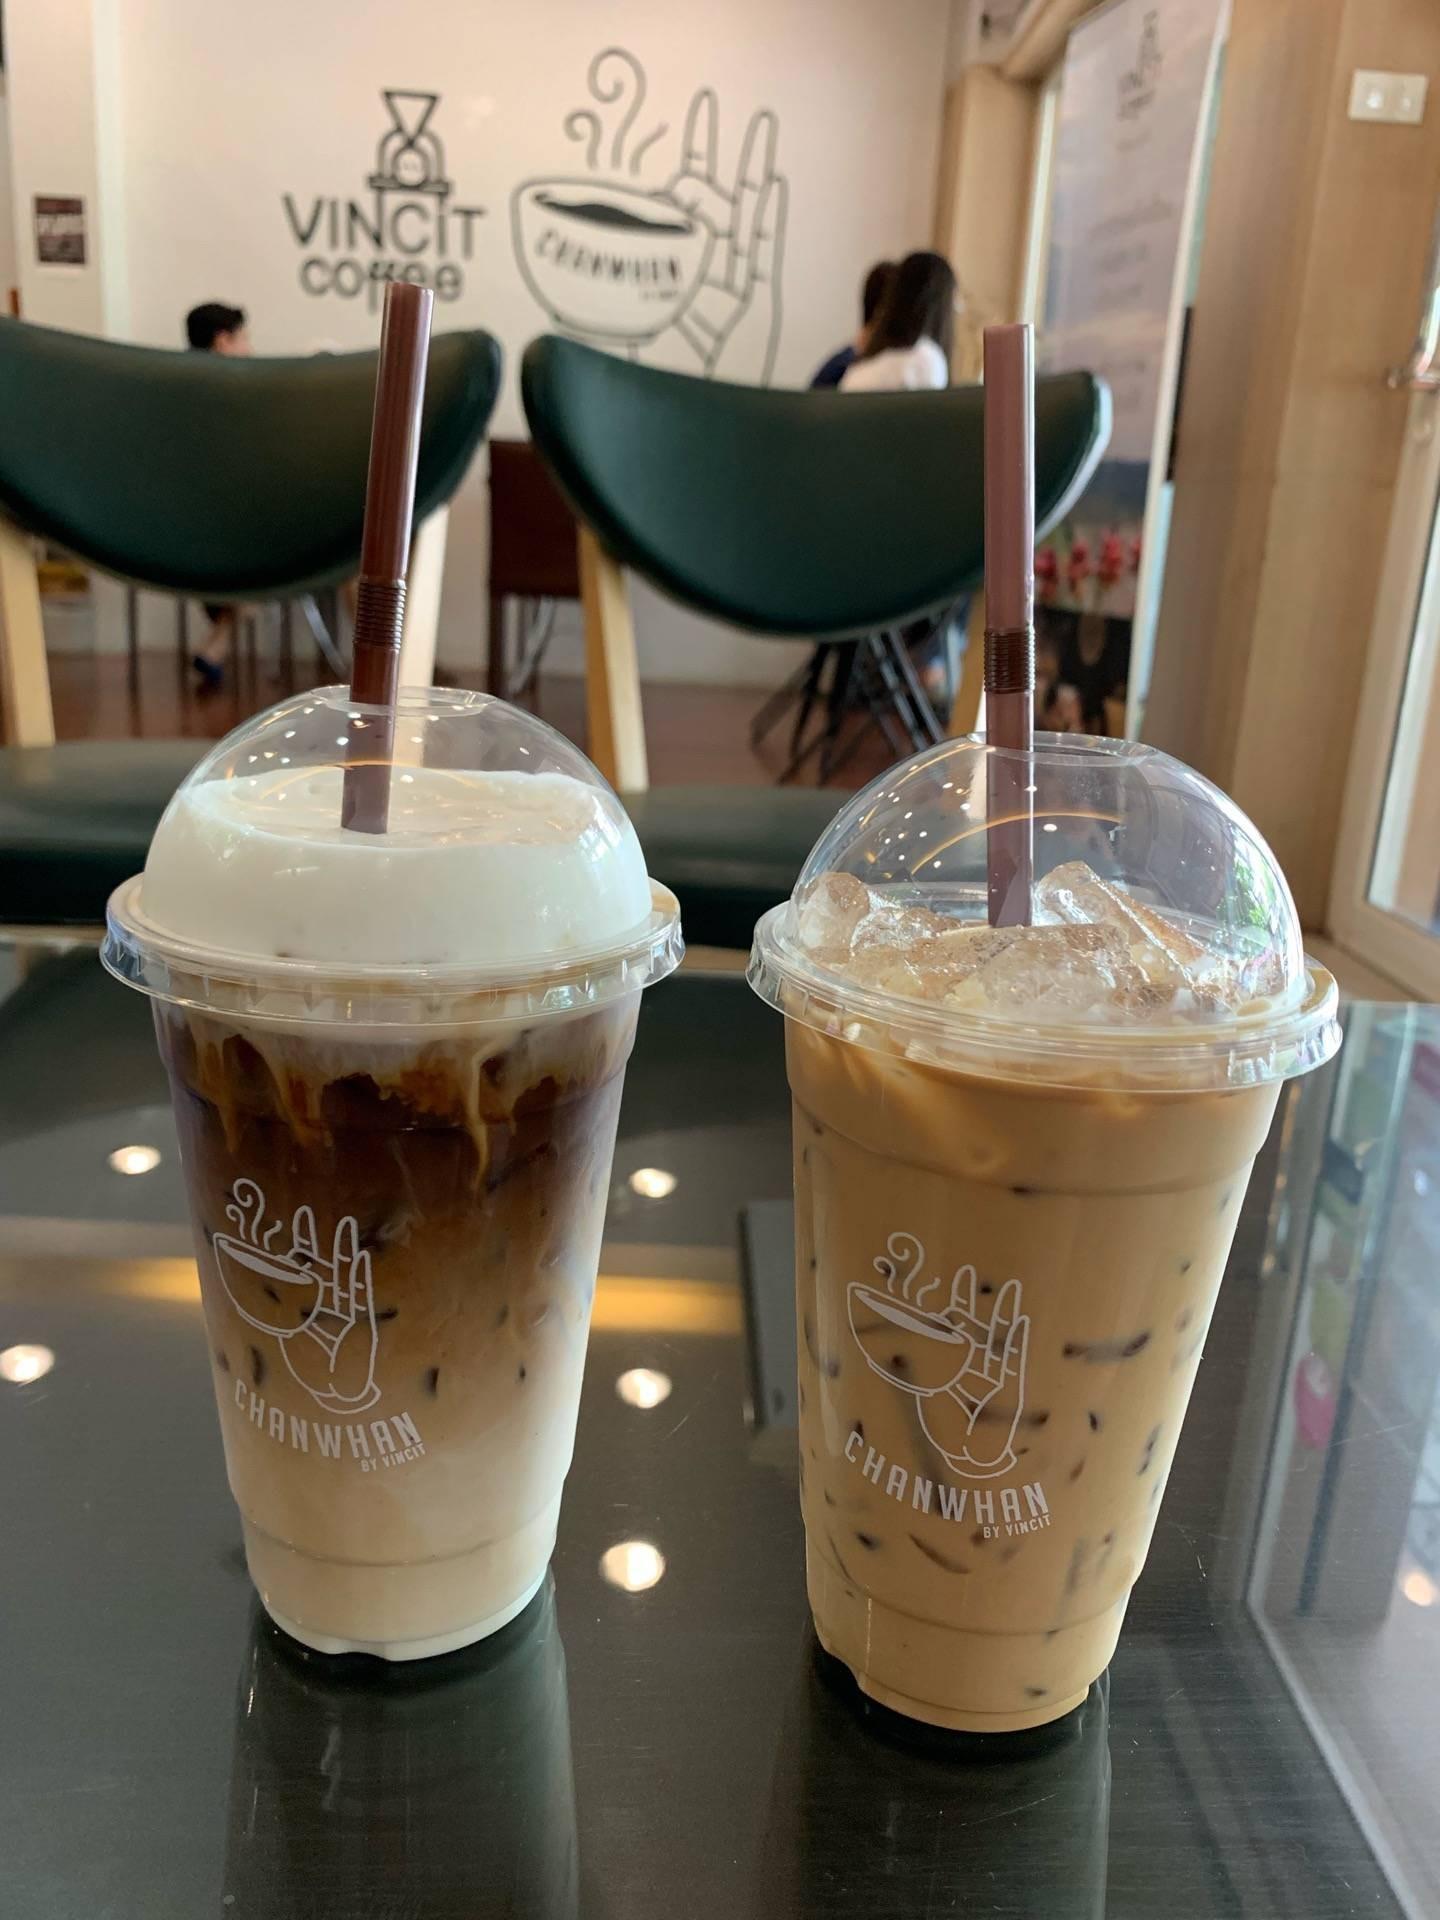 Chanwhan By Vincit Coffee